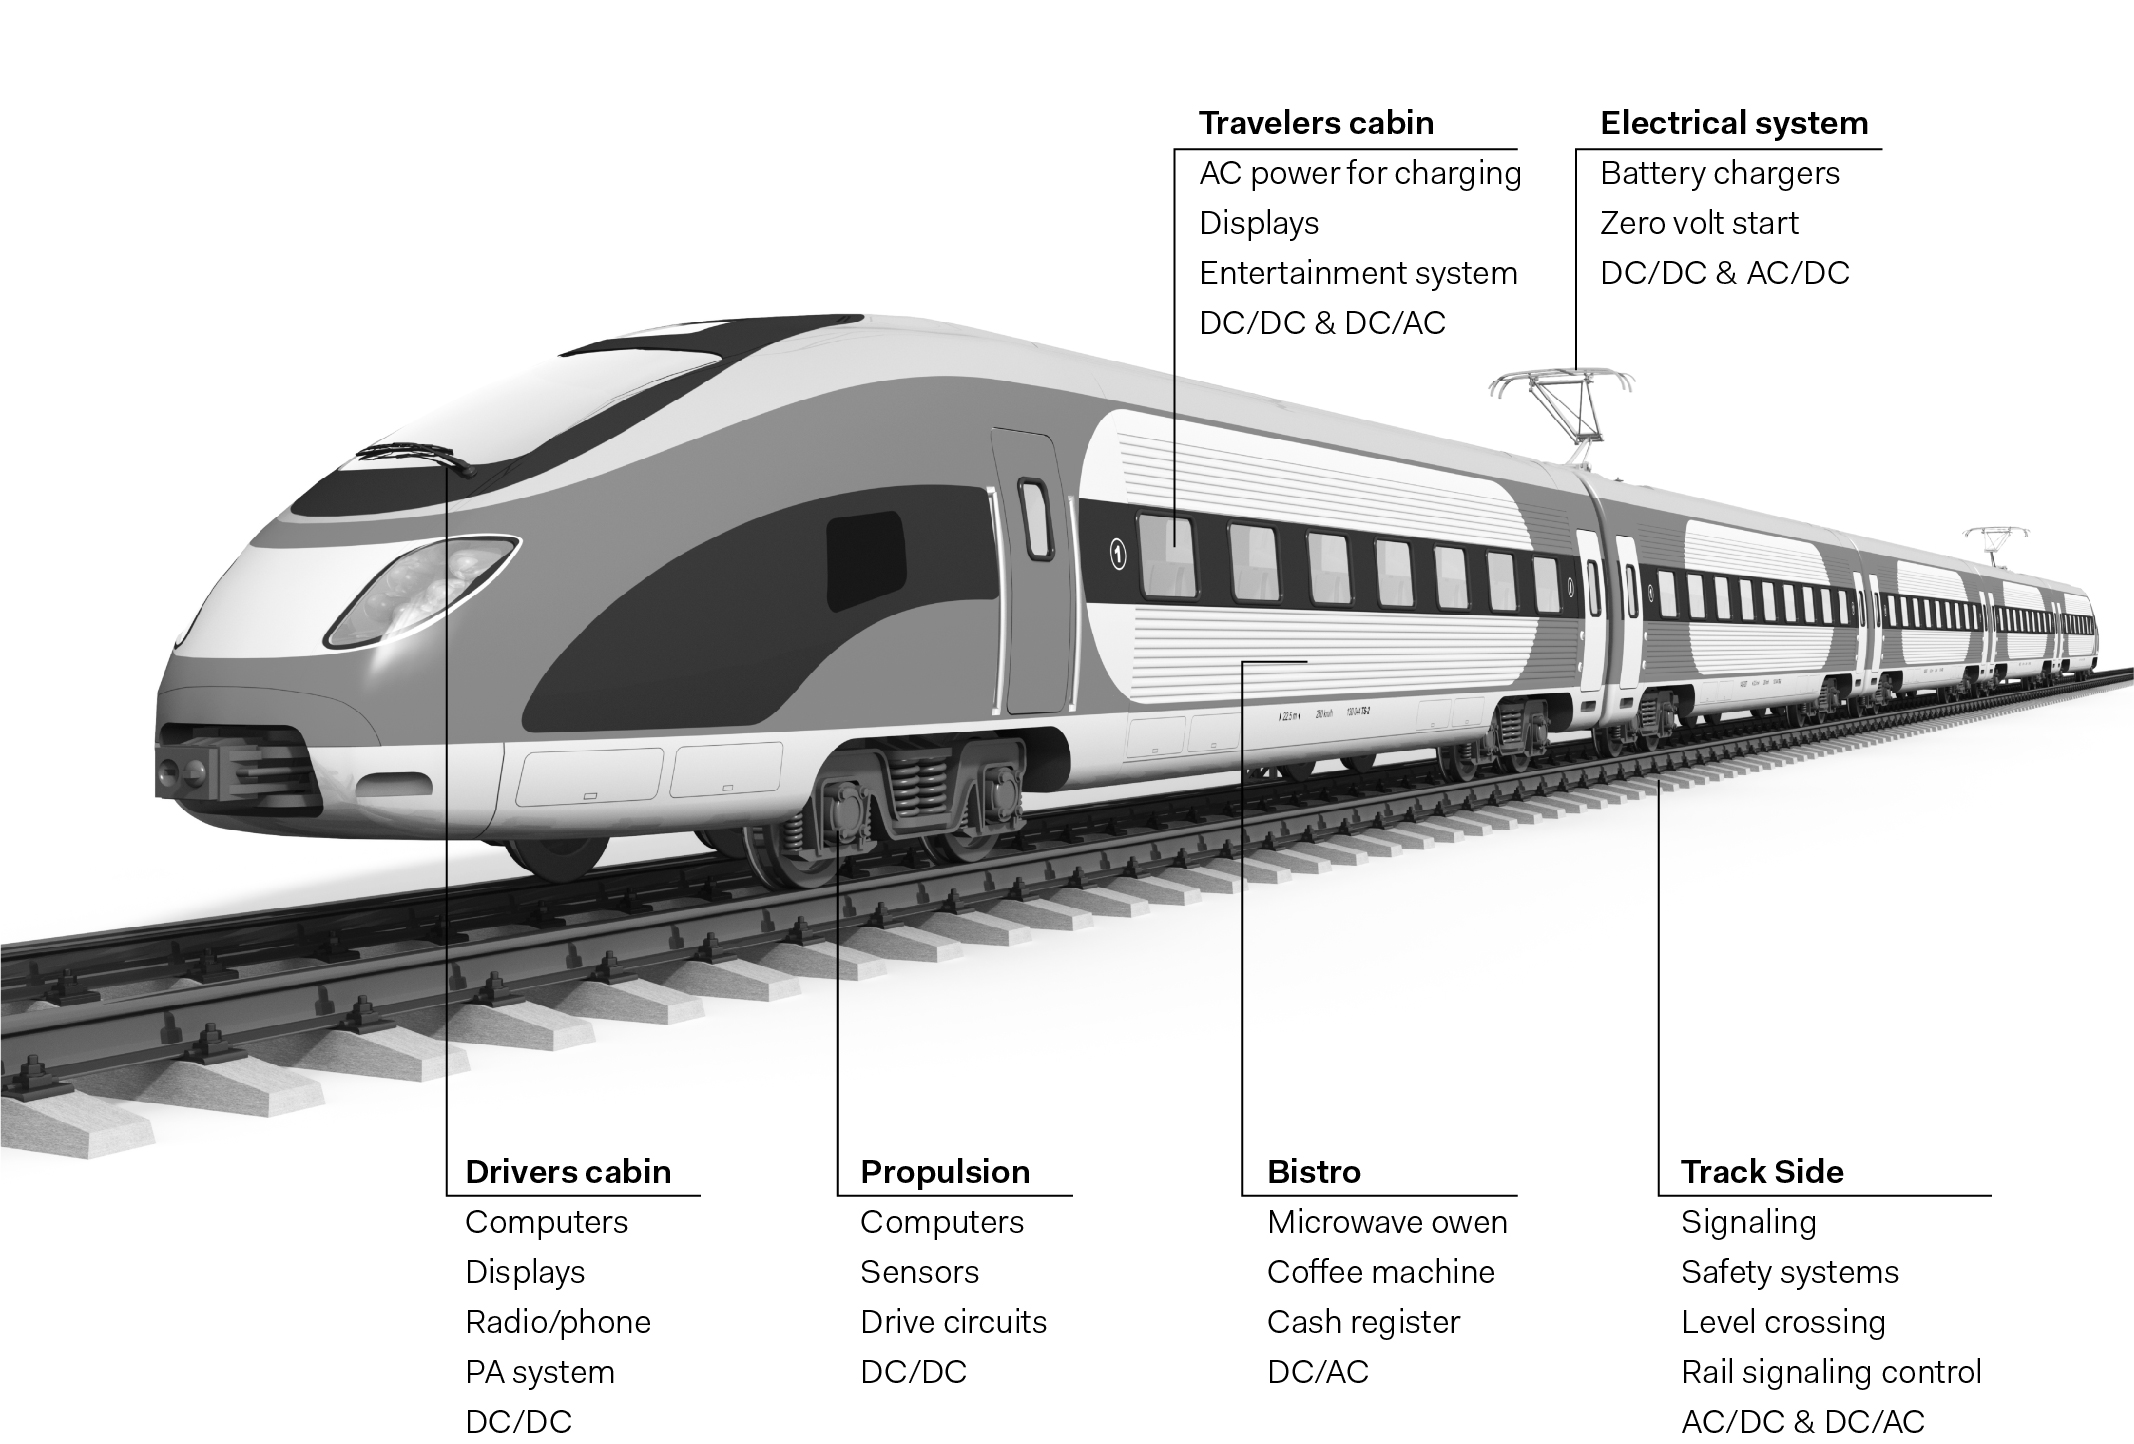 PRBX Railway applications